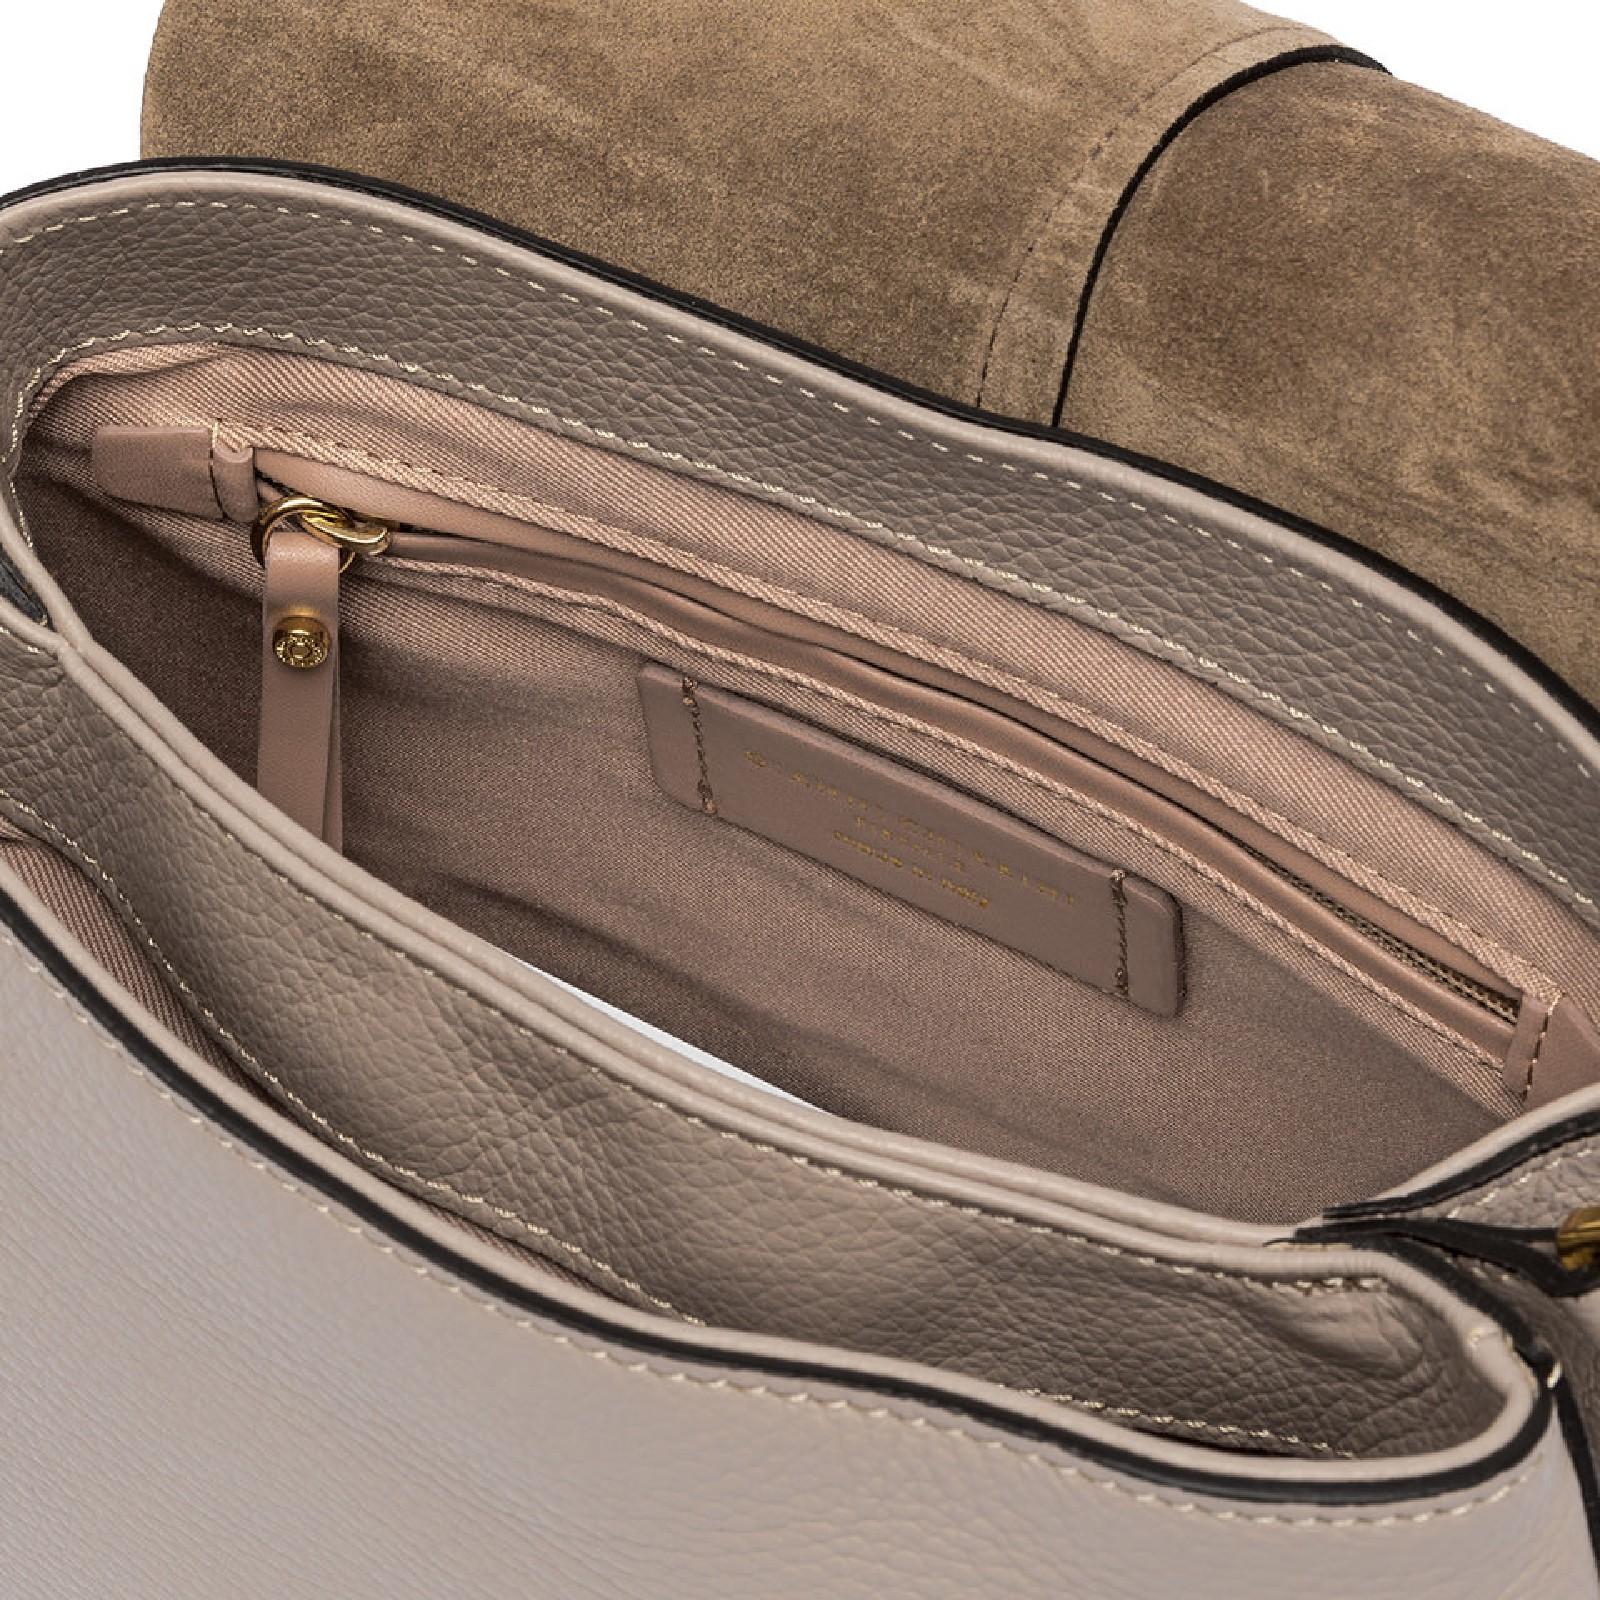 2ff6d80bbb Piquadro Portafoglio tessuto Verde - Raguso 1963